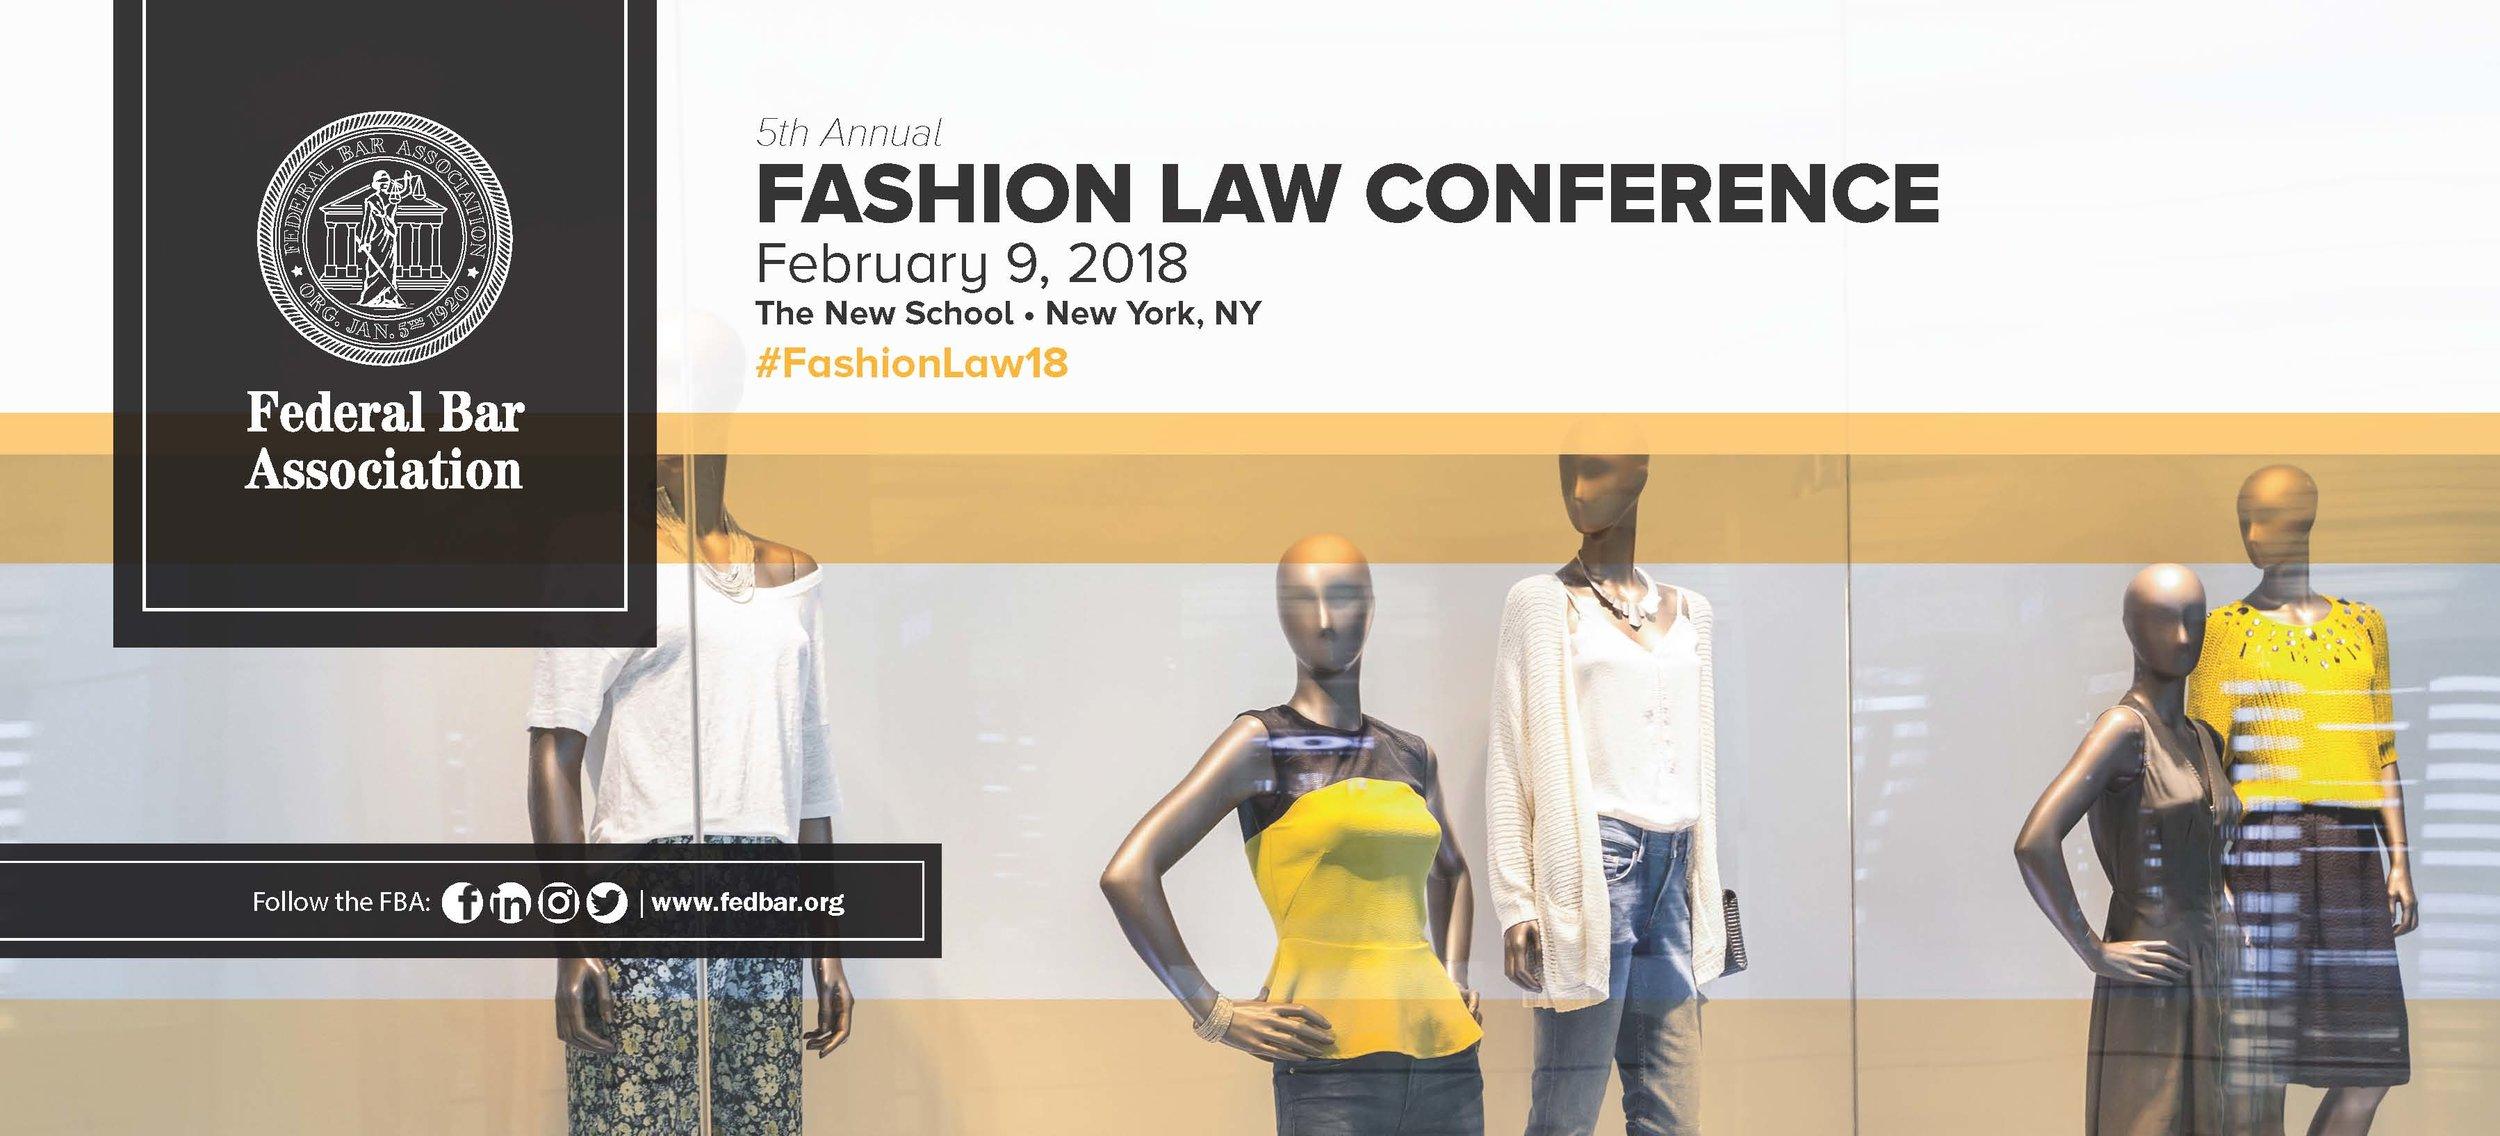 2018 fashion law mailer v.6_Page_1.jpg